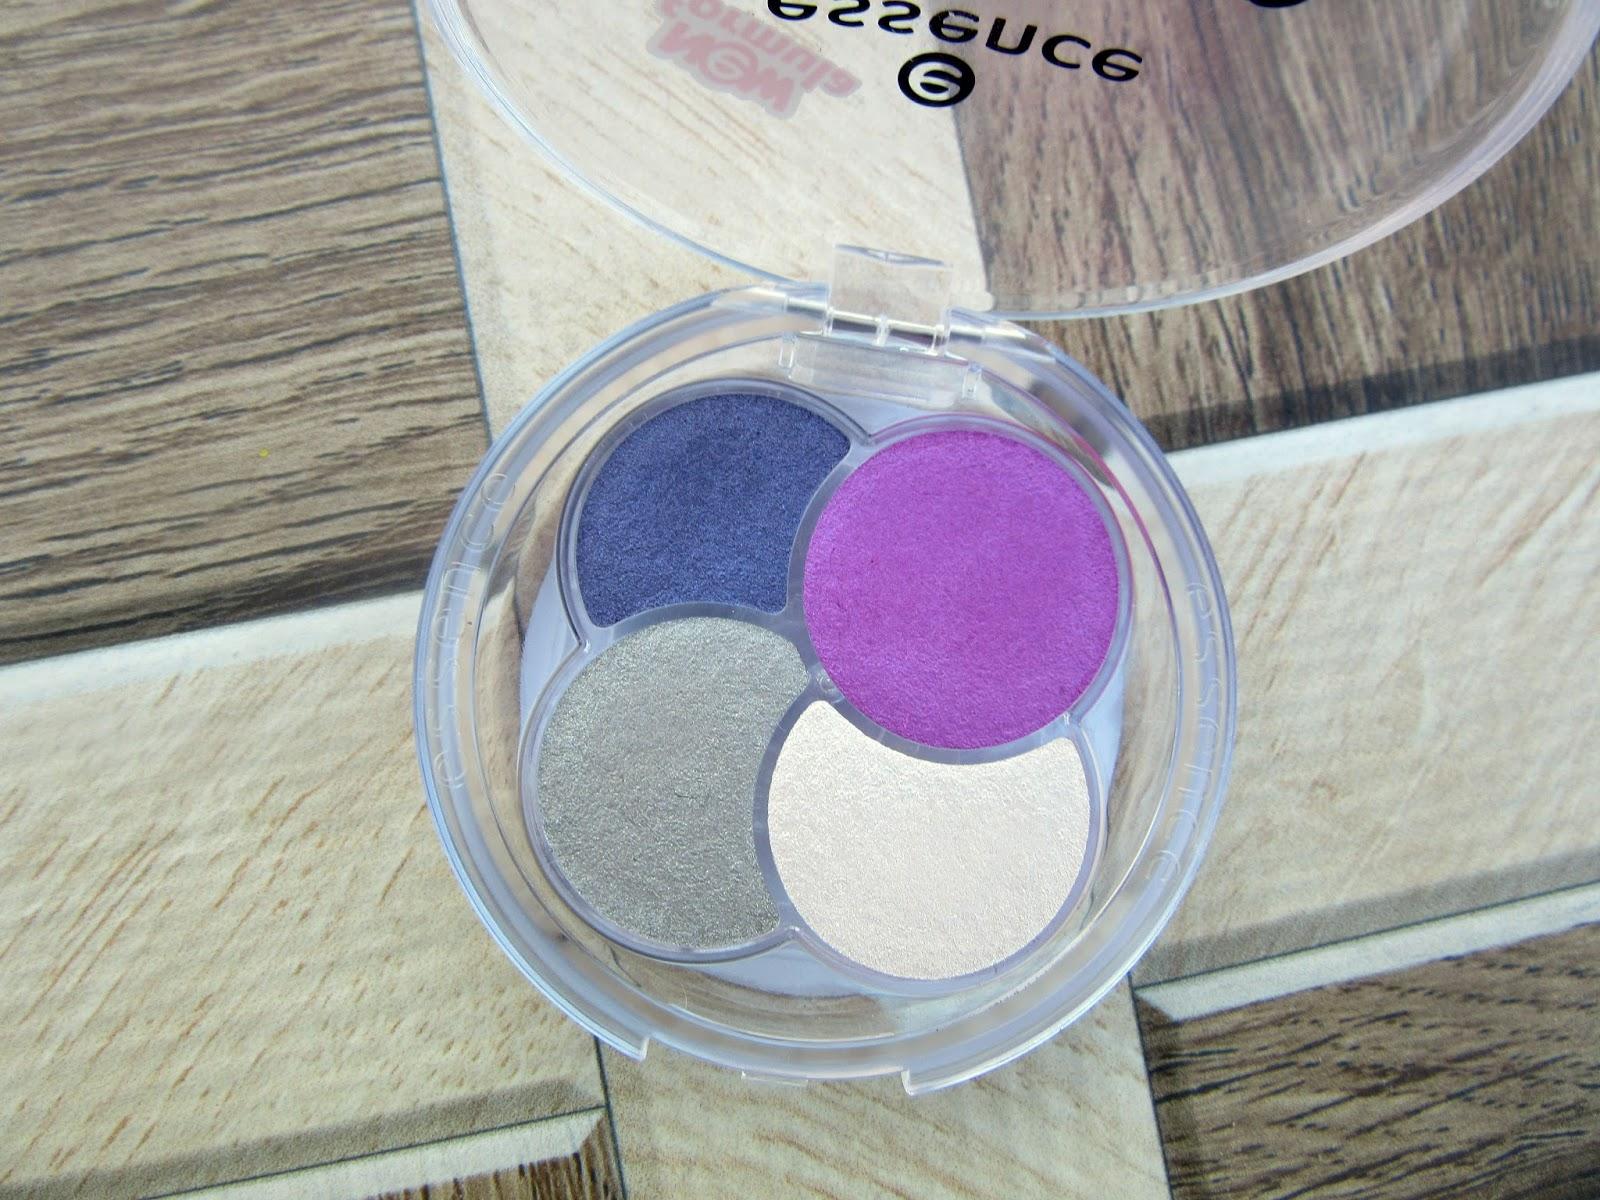 Essence Quattro Eyeshadow 'Magenta and Me!' Review, Swatch, FOTD